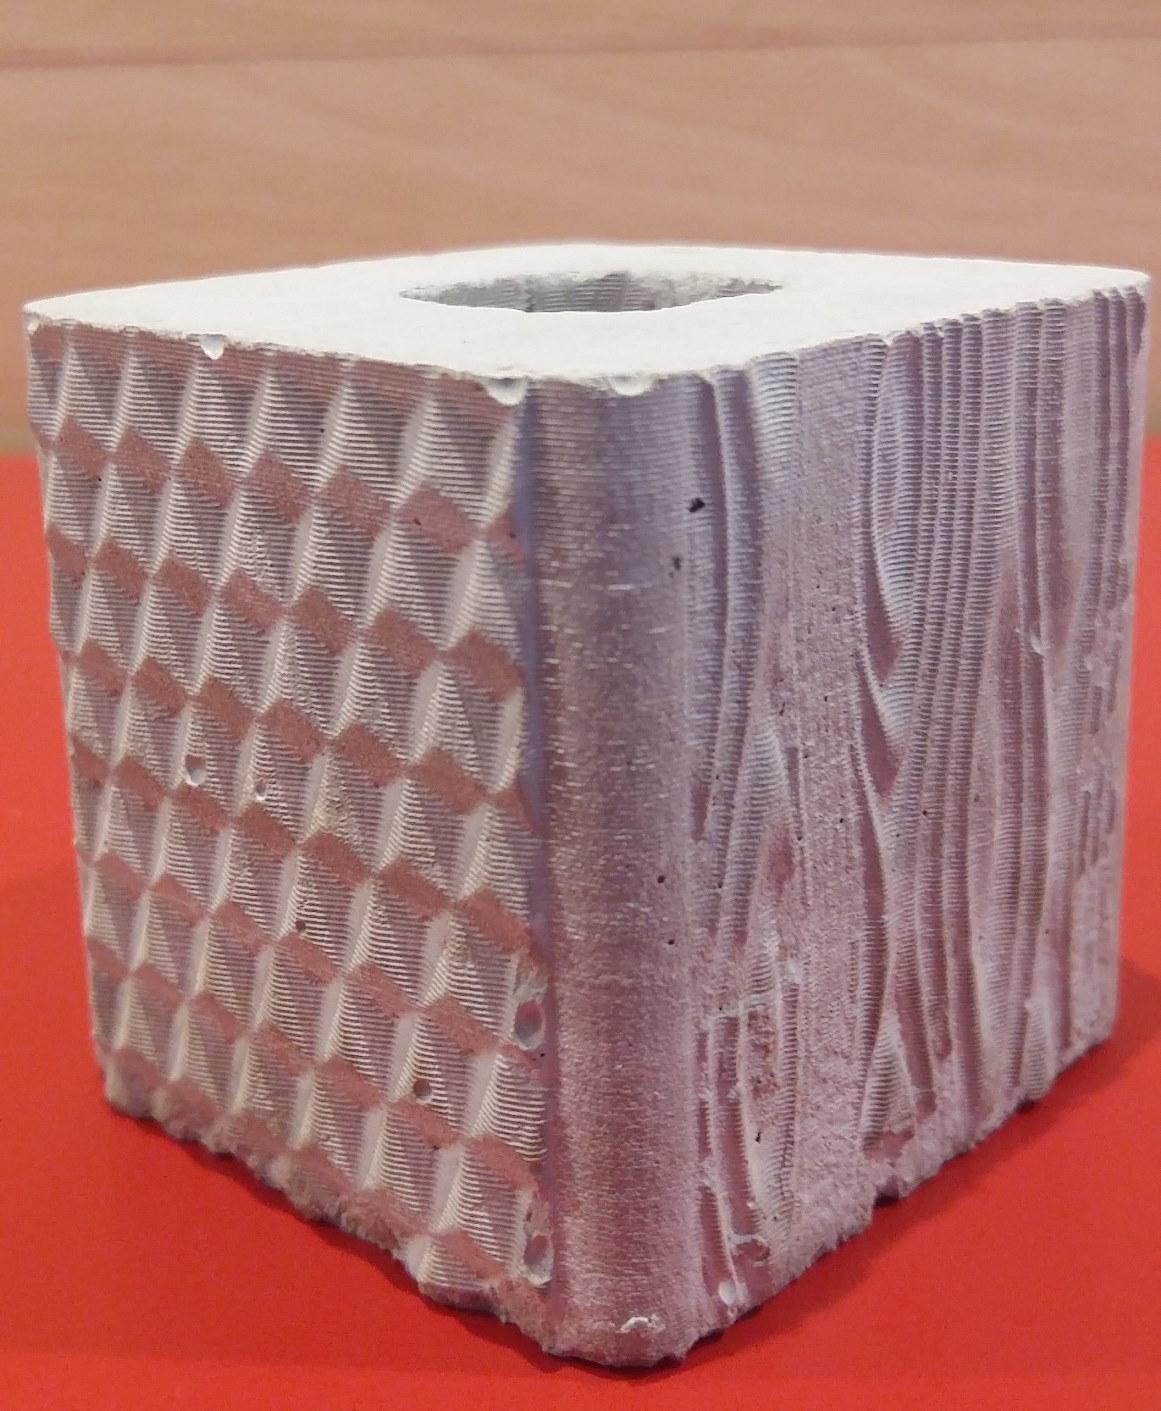 Concerte cube / Dim = 5cmX5cmX5cm